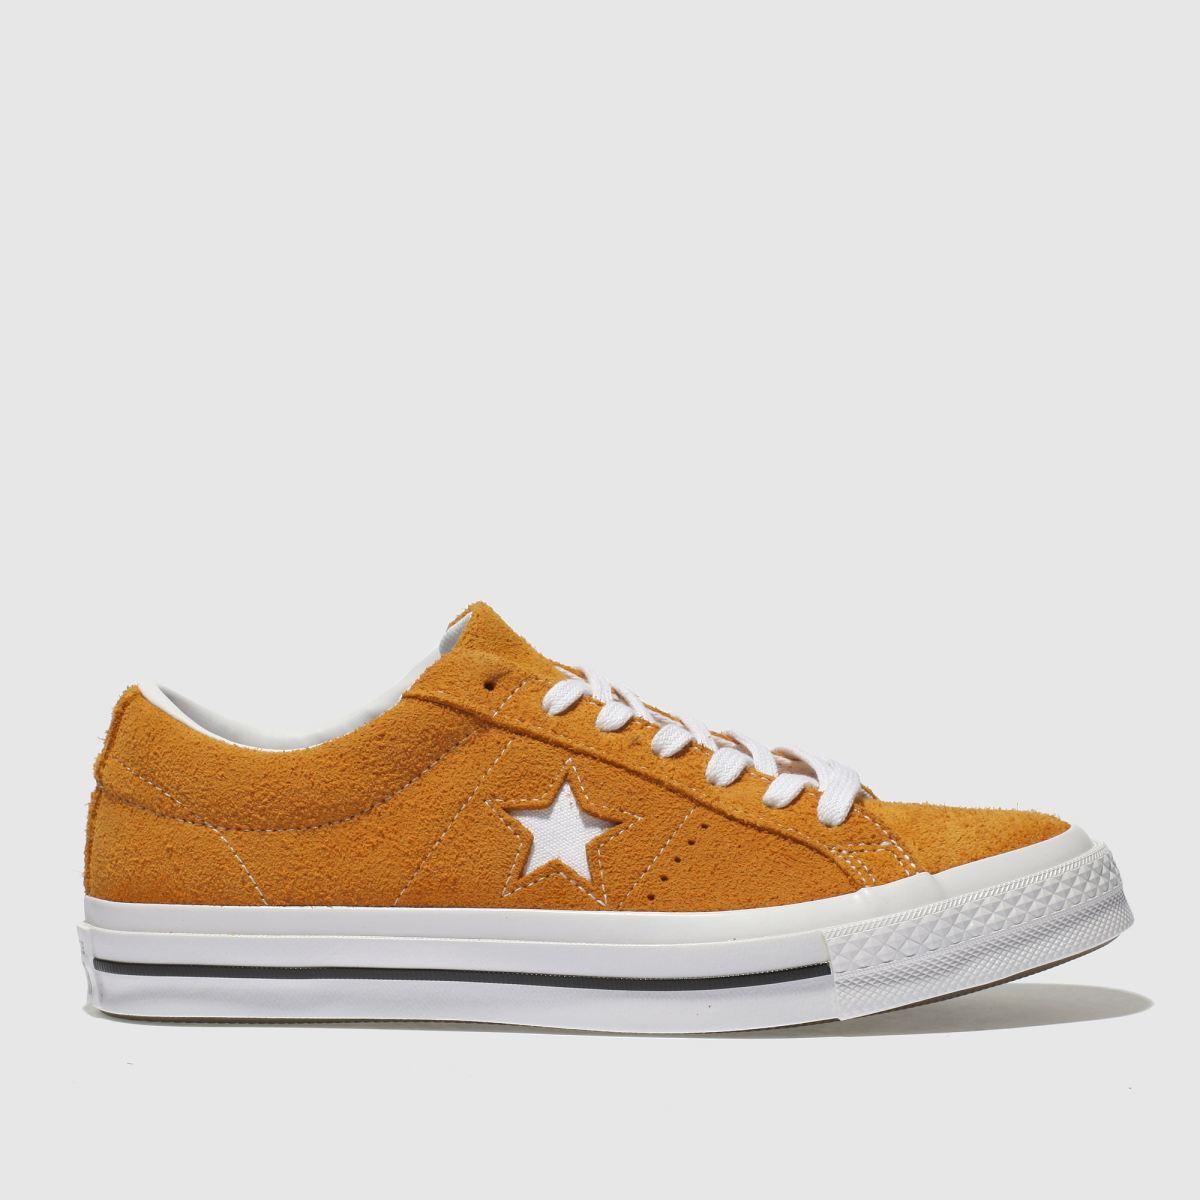 Converse Orange One Star Ox Vintage Suede Trainers